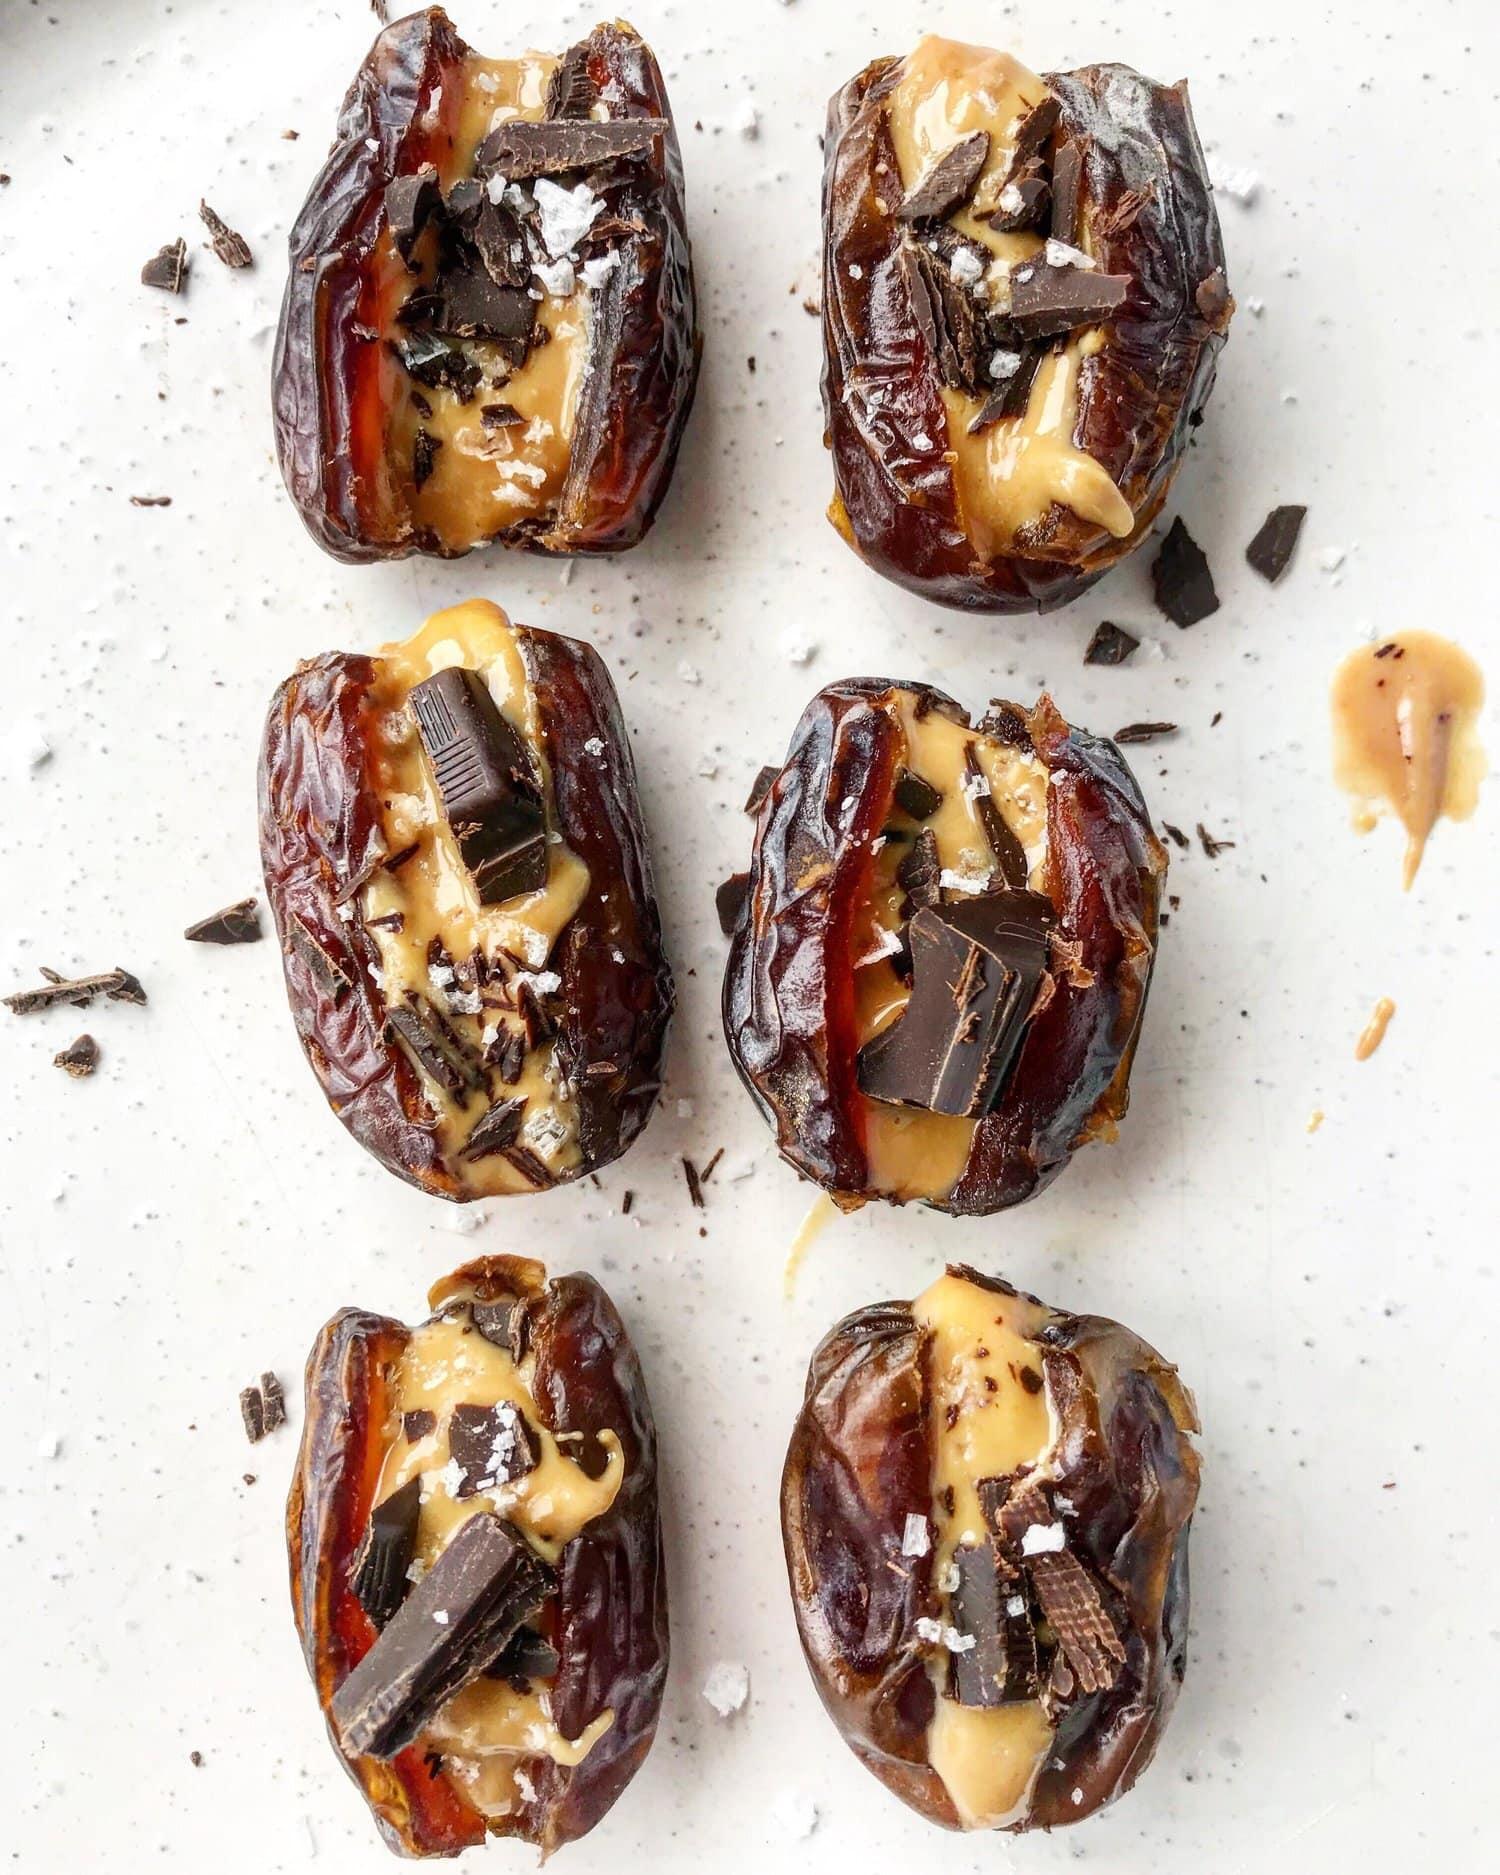 Stuffed medjool dates with peanut butter, dark chocolate and sea salt.